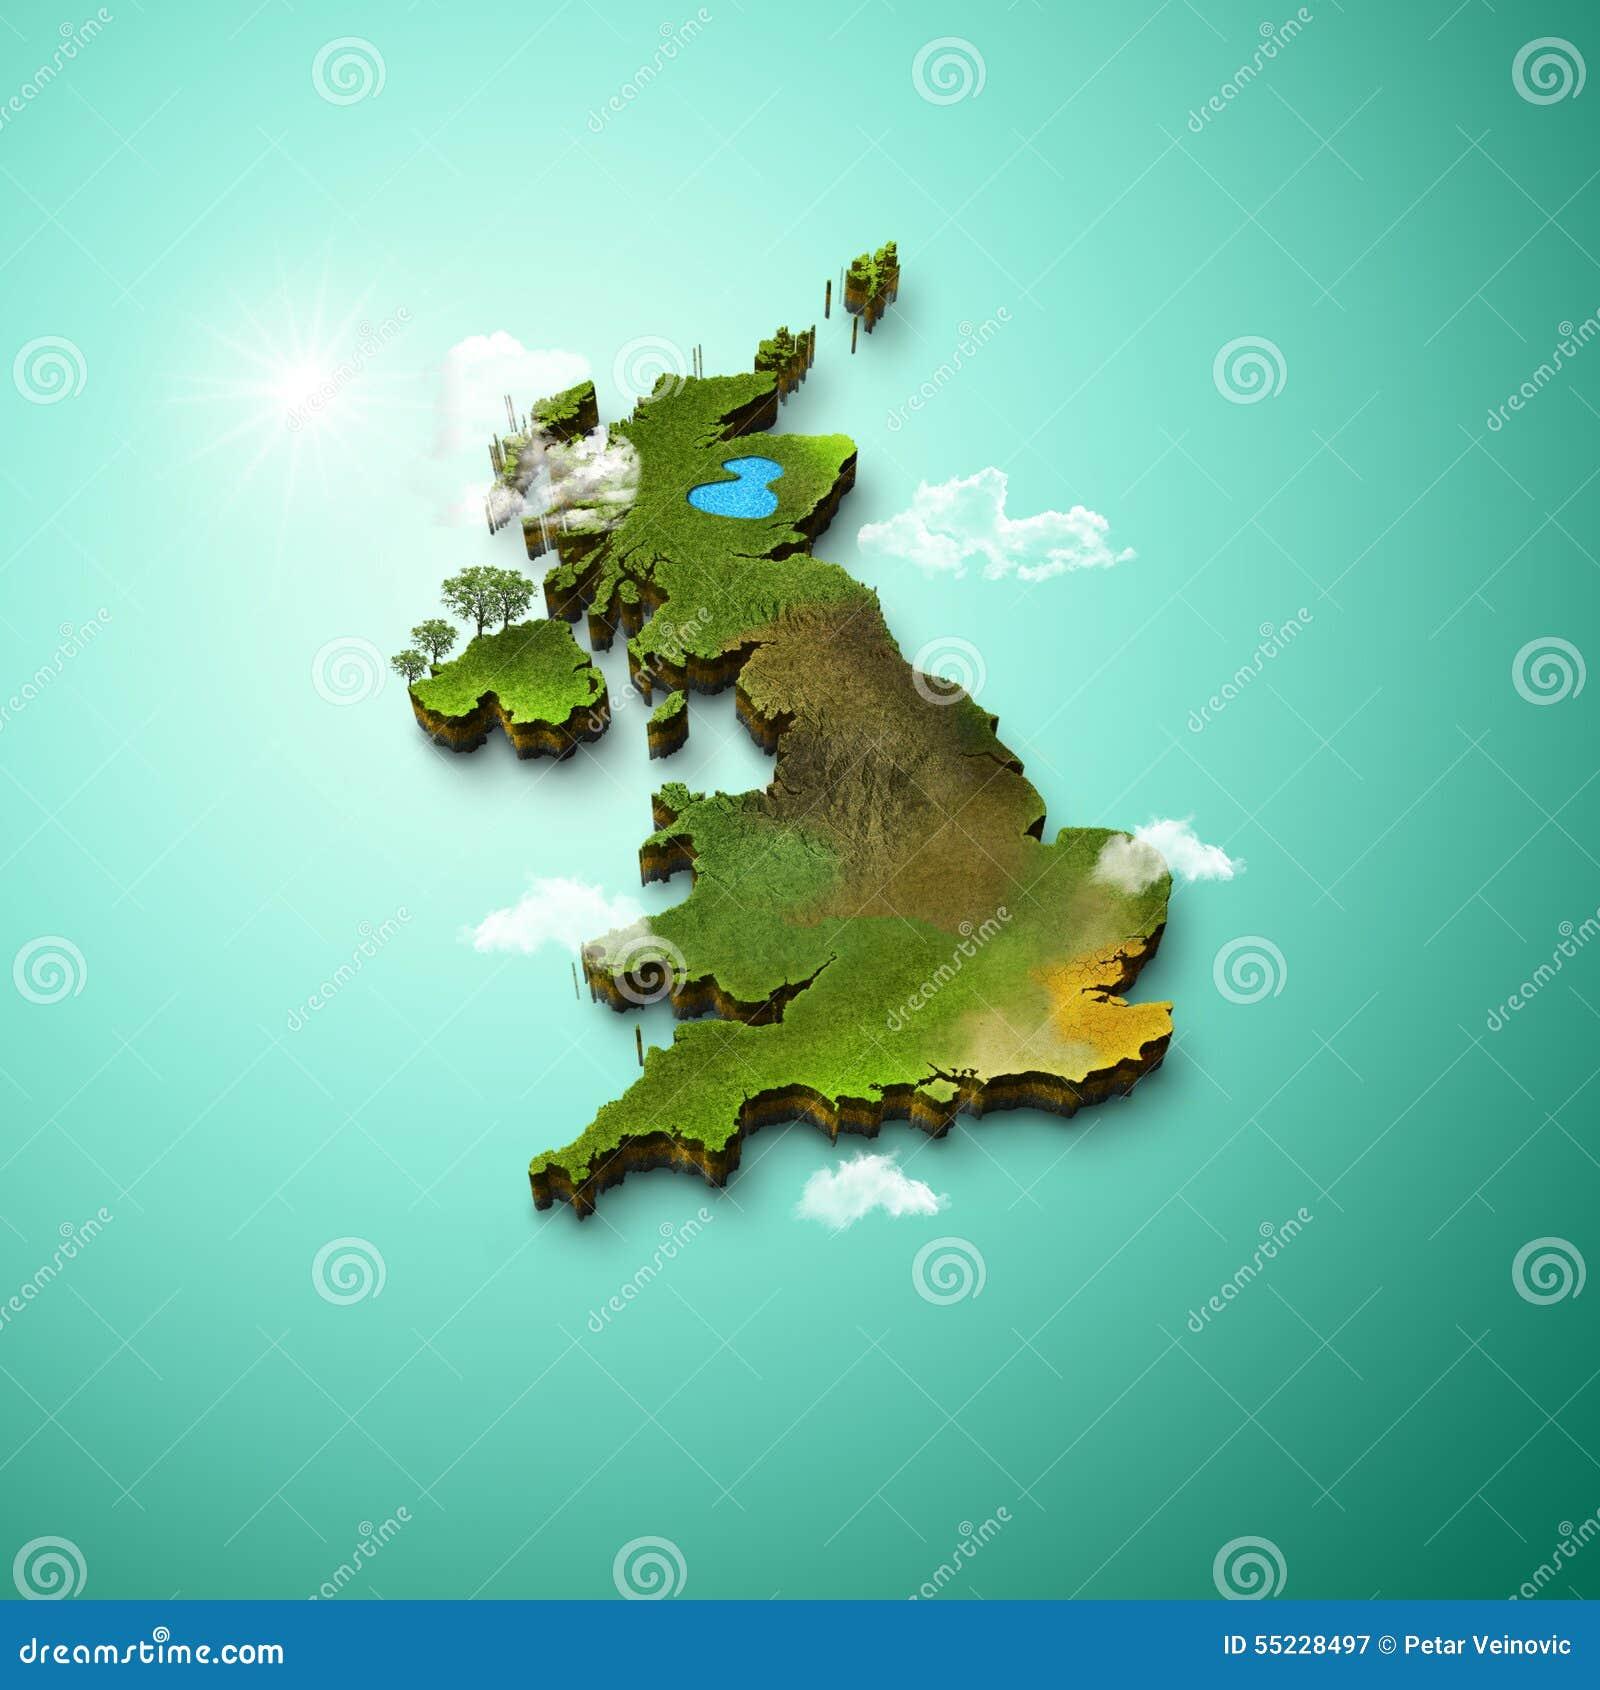 3d Terrain Map Of Uk.Realistic 3d Map Of United Kingdom Stock Illustration Illustration